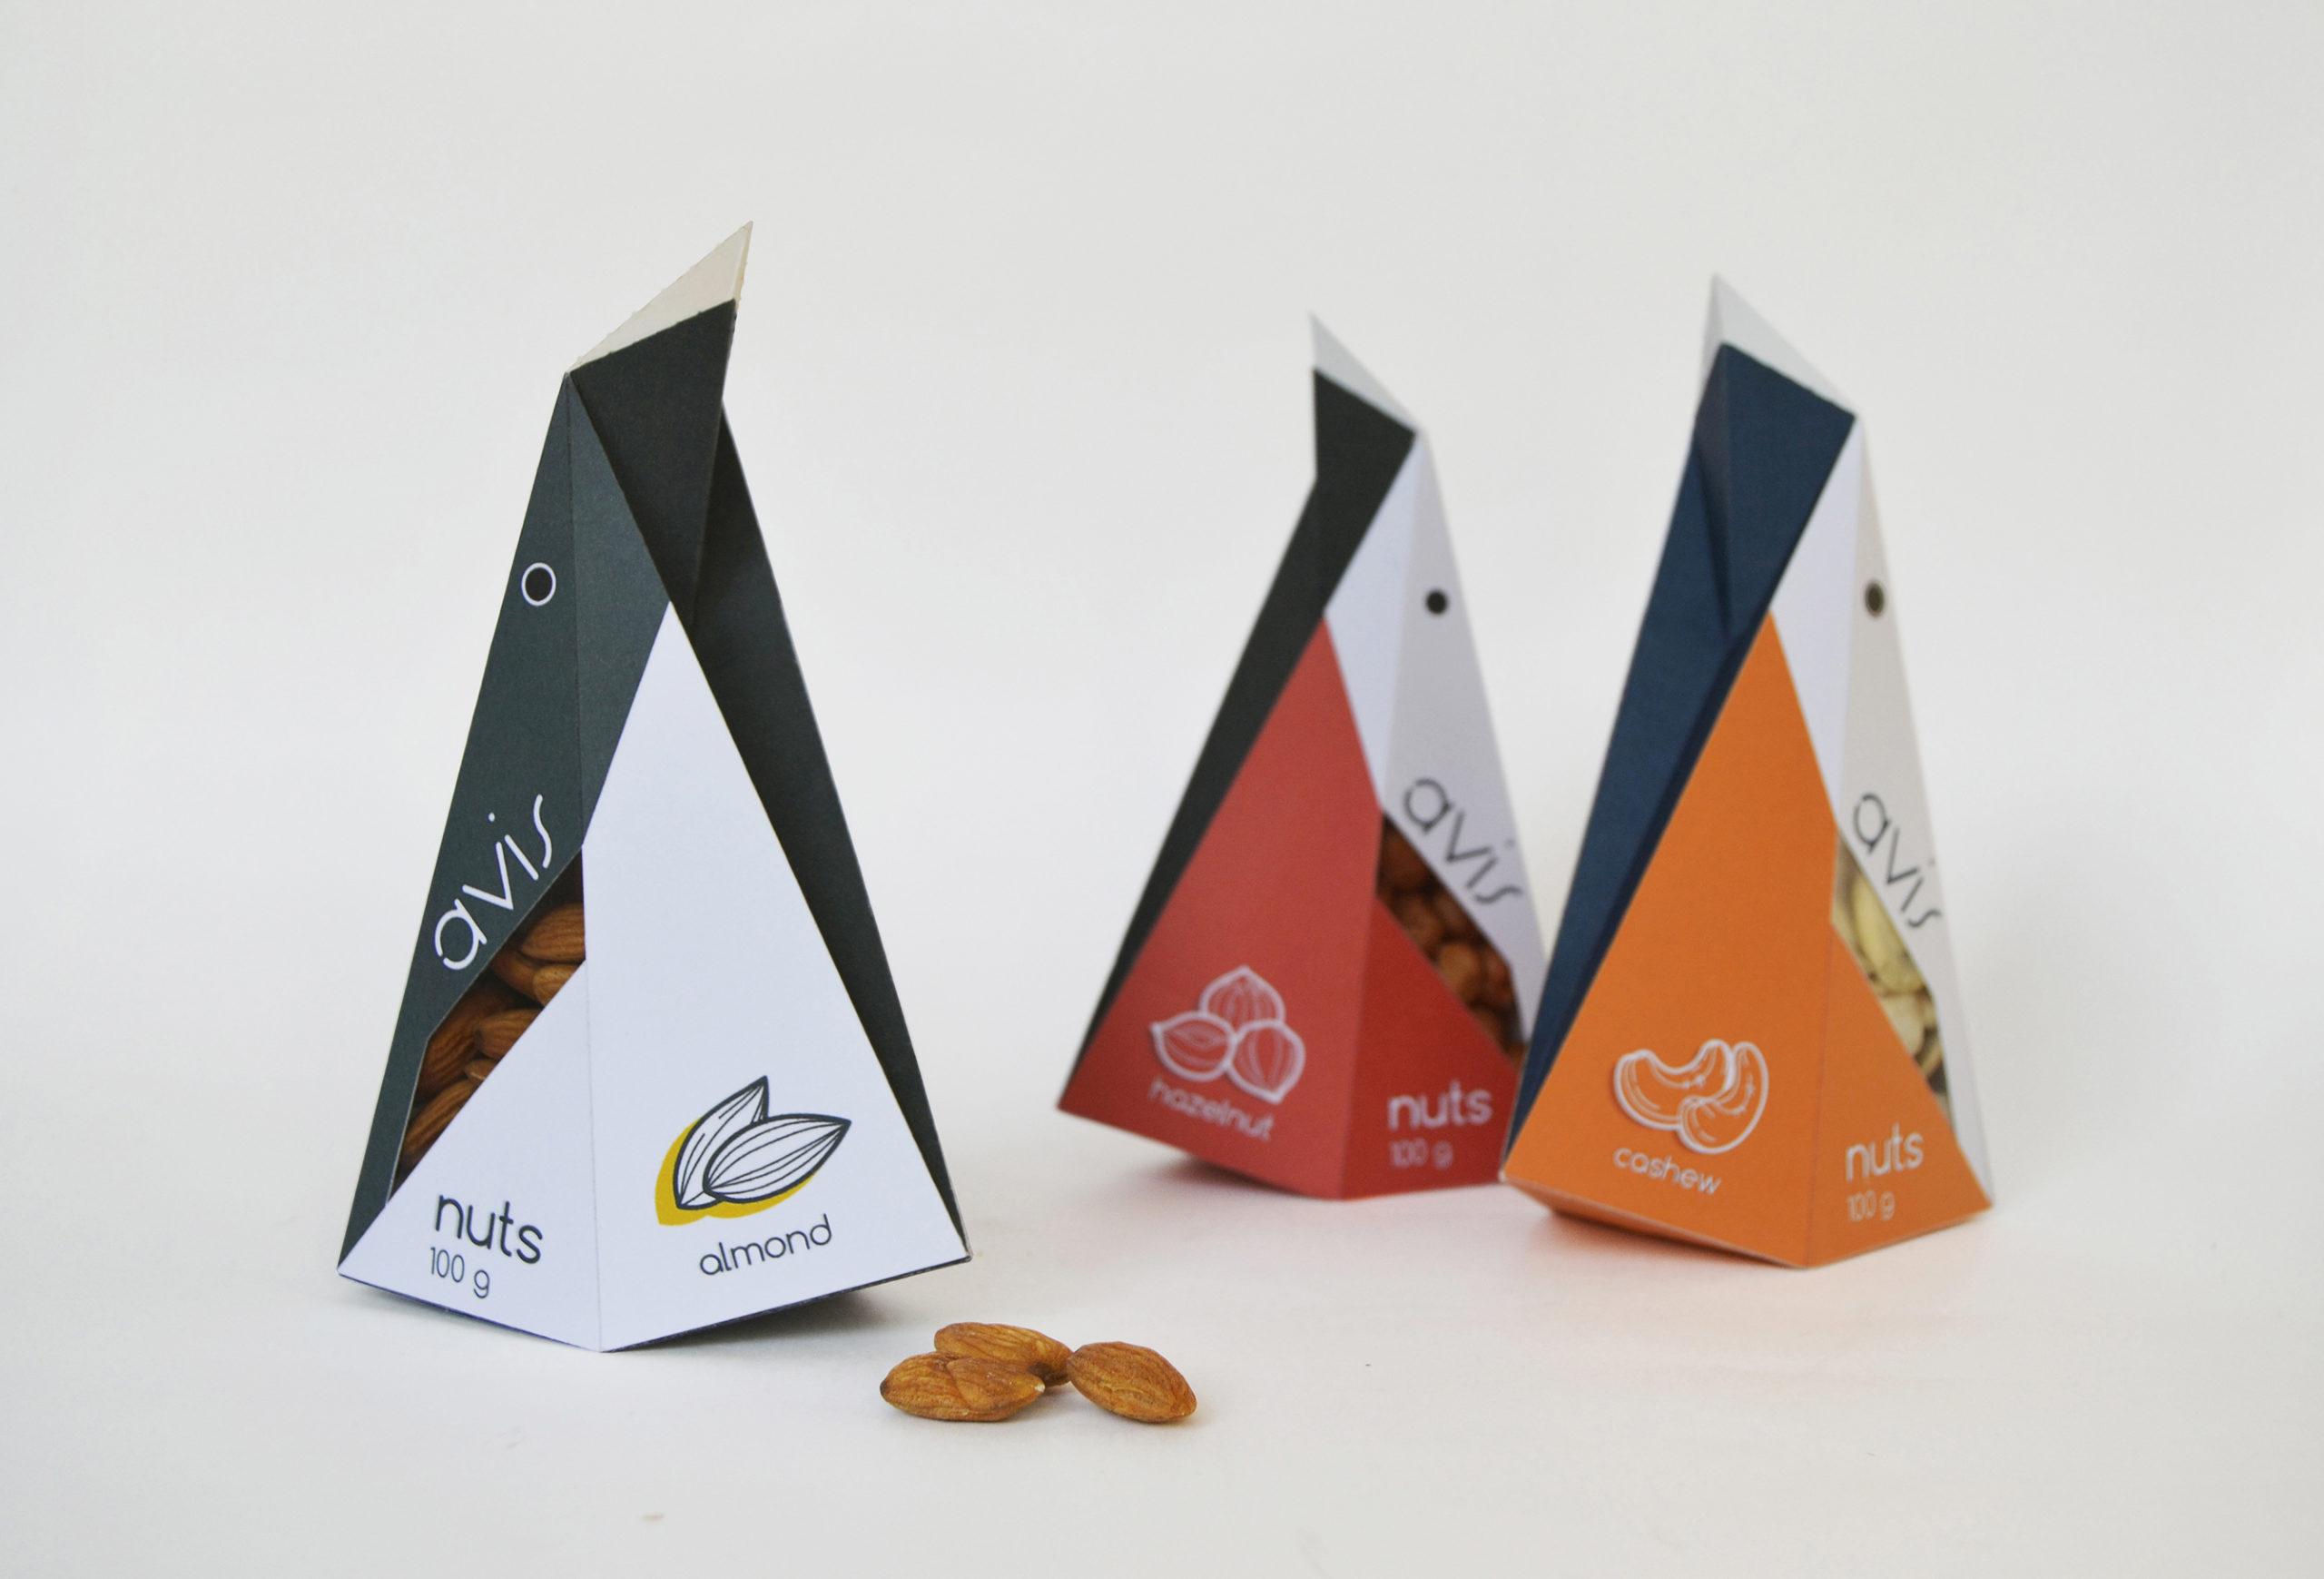 carton-award-image 236203